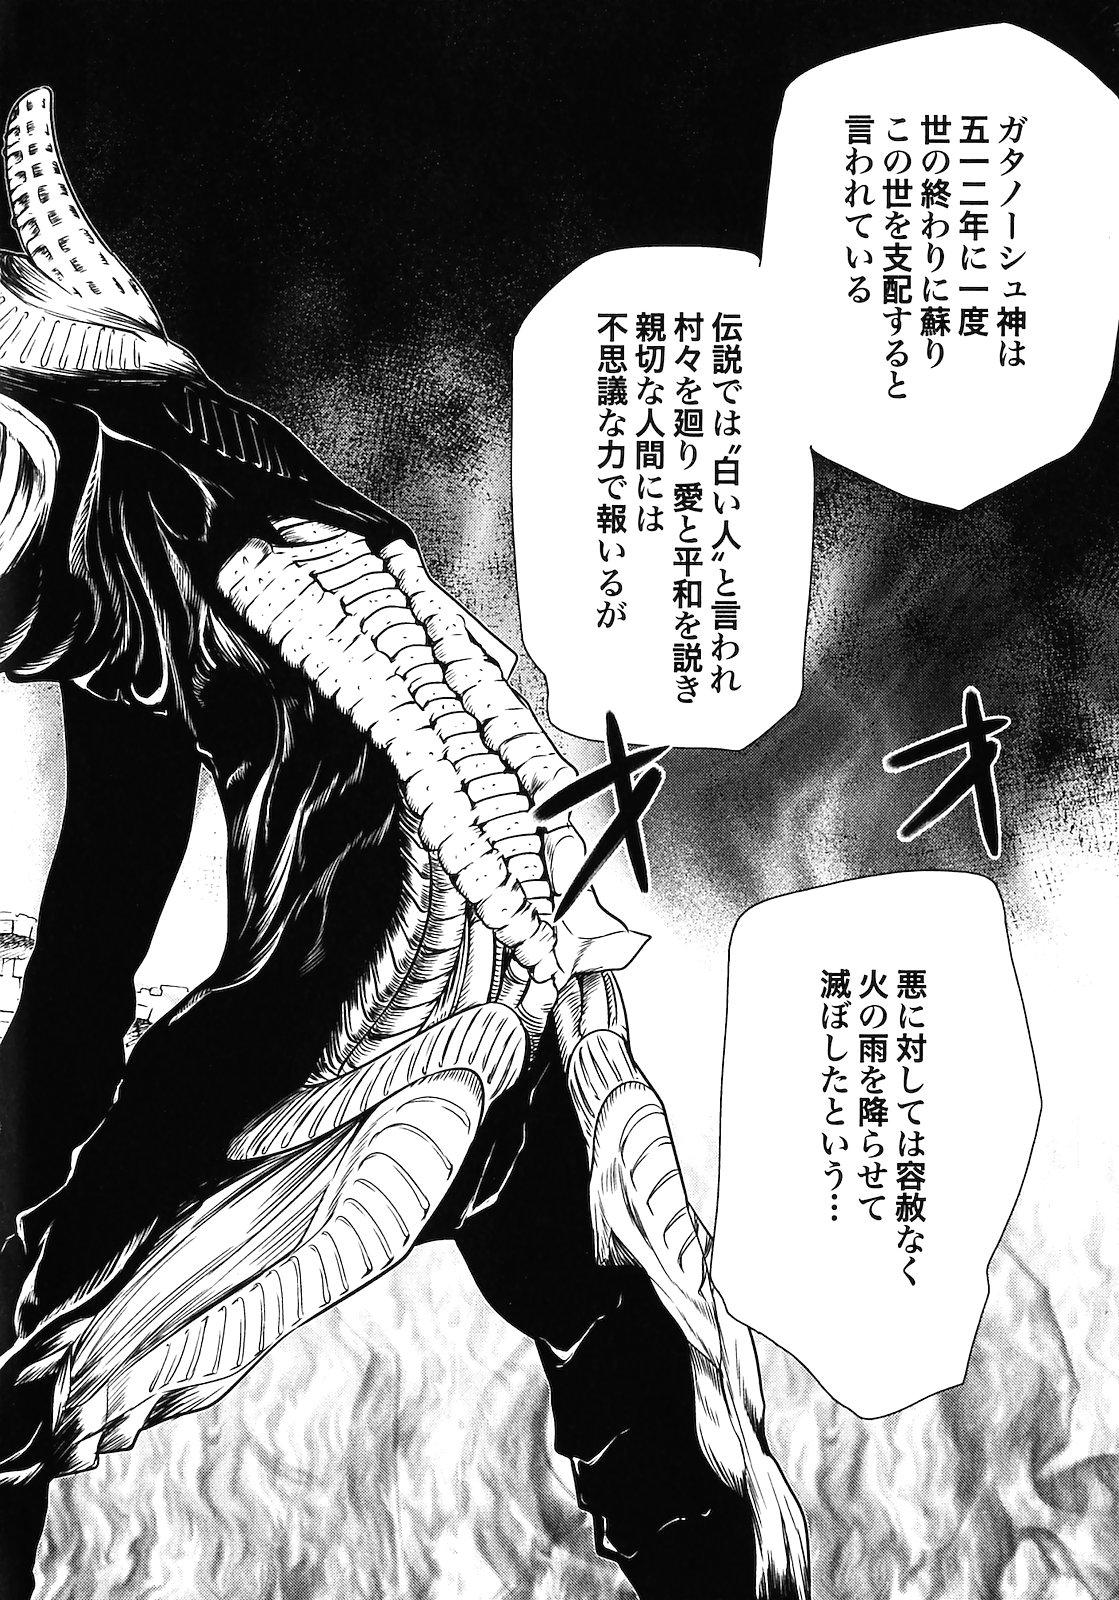 Makyo no Shanana Vol.02 95